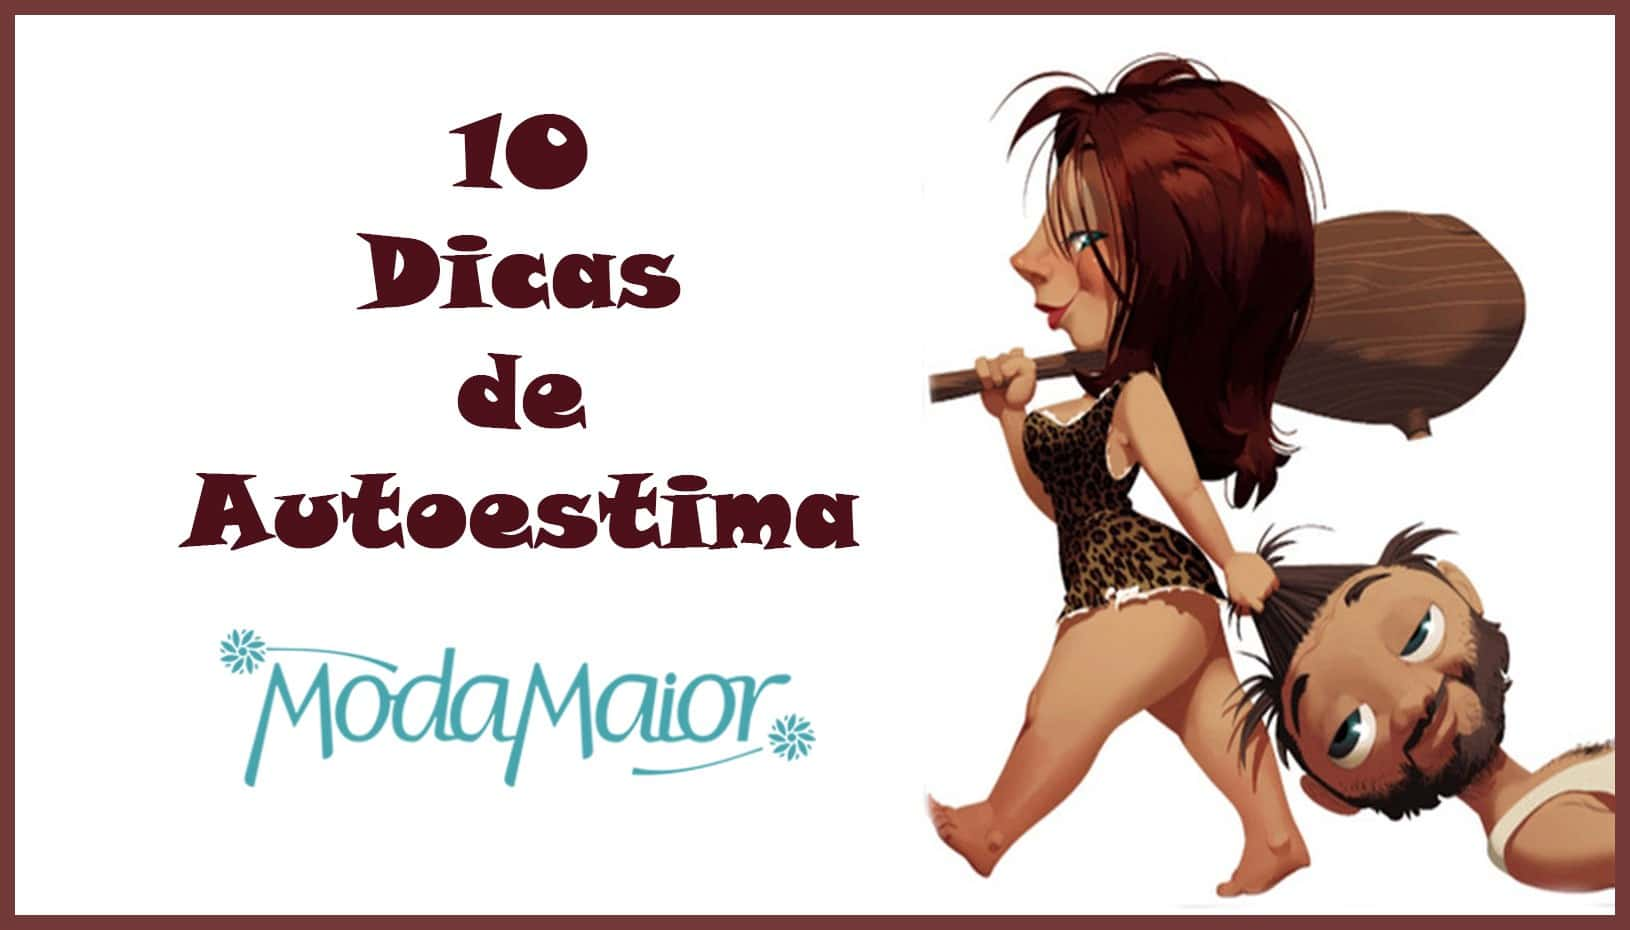 10 dicas de autoestima